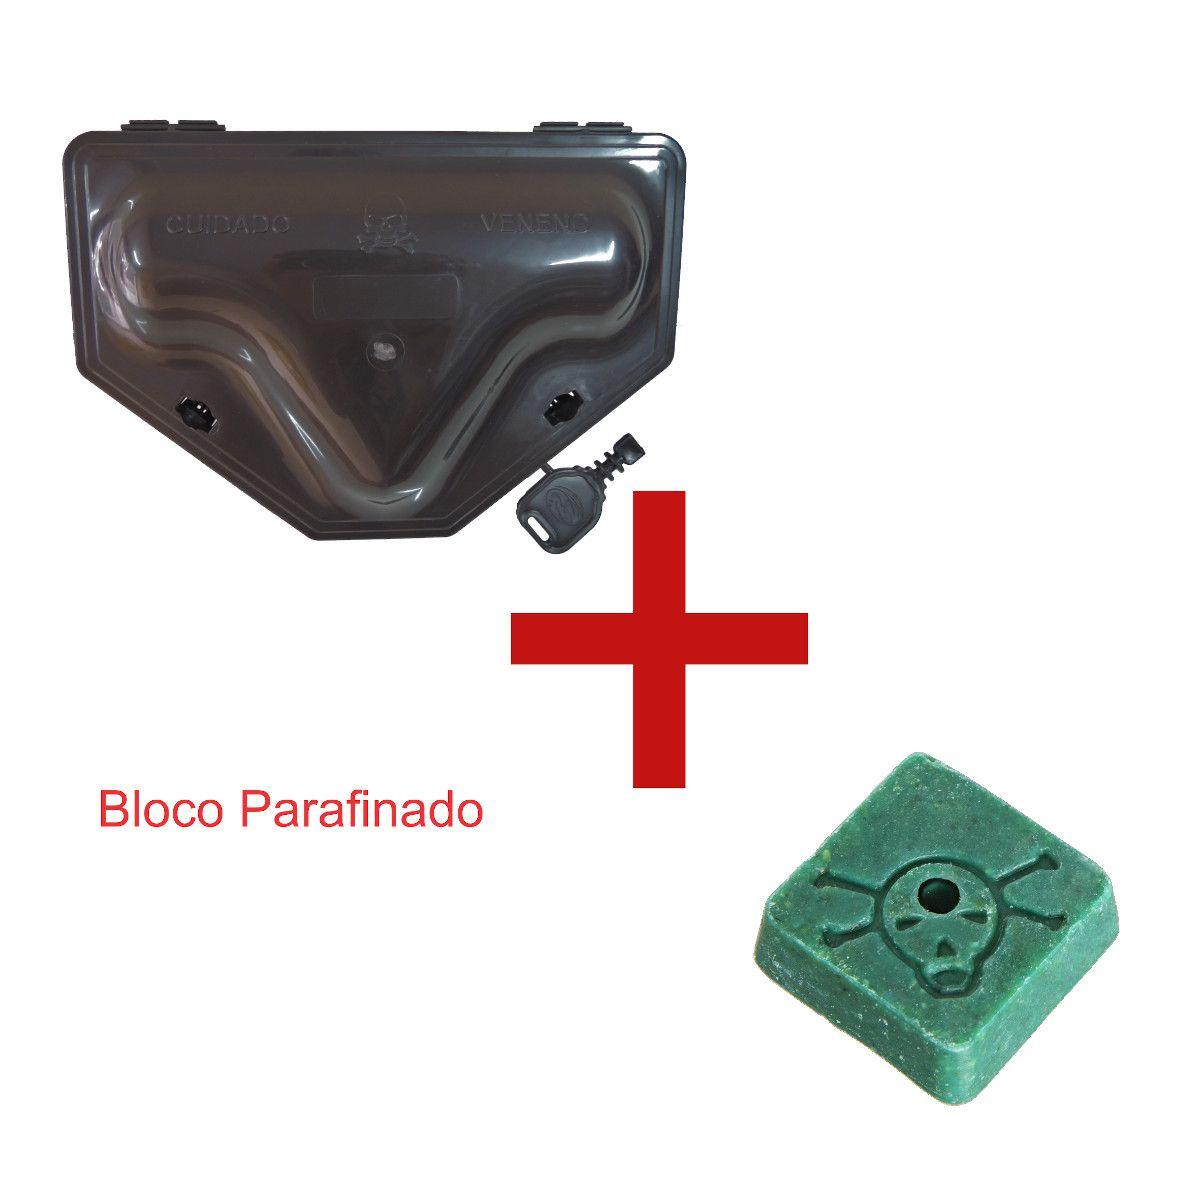 KIT 25 Porta Iscas Reforçado Ratoeira 2 TRAVAS Chave p/Ratos